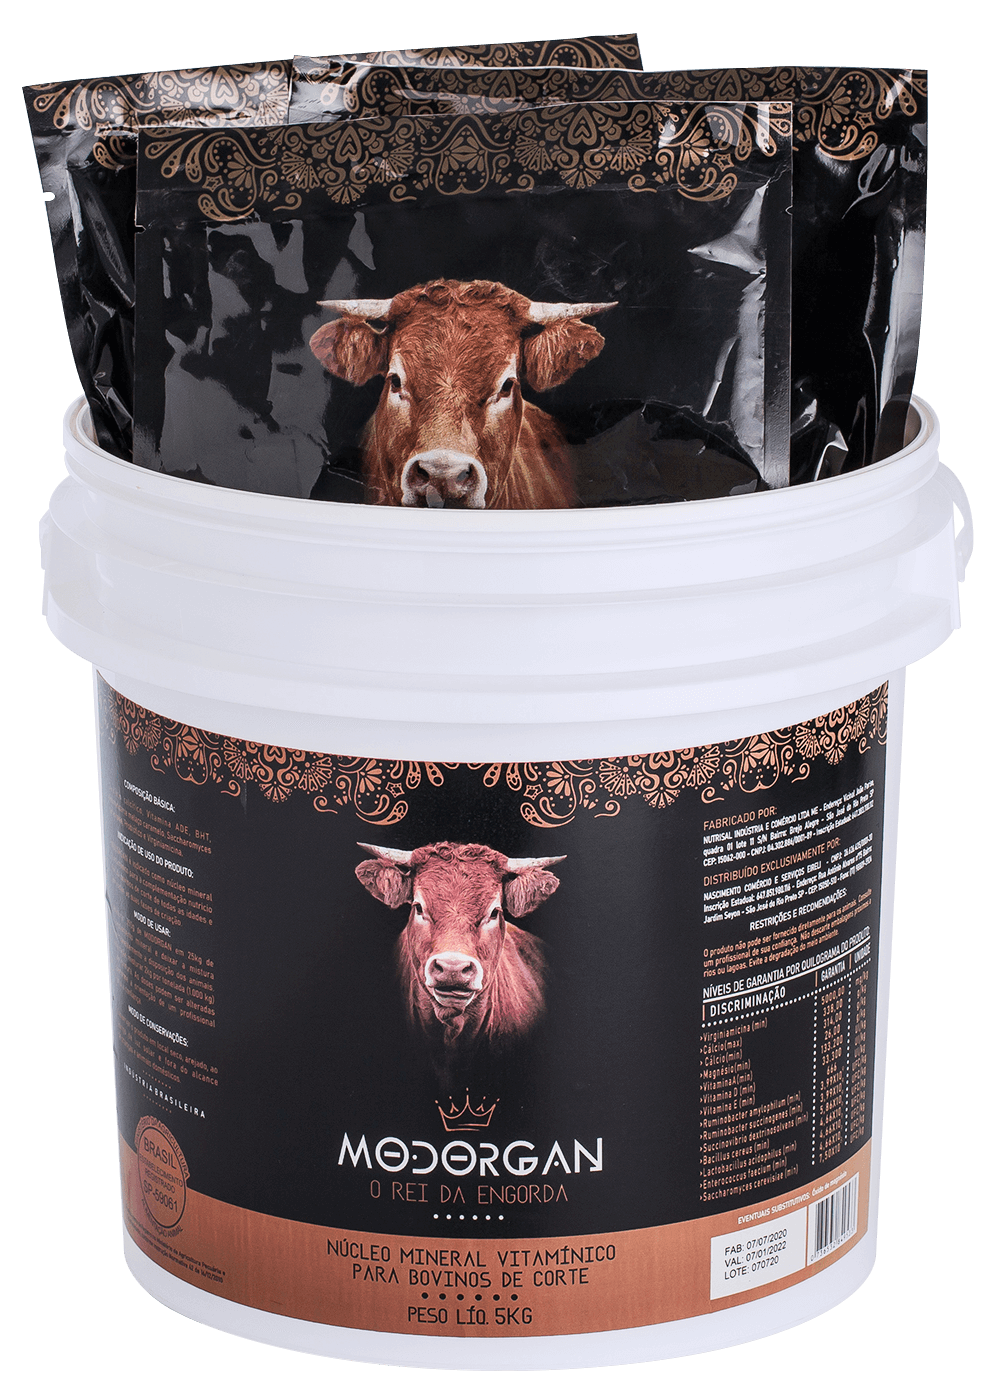 Produto Modorgan - O rei da engorda